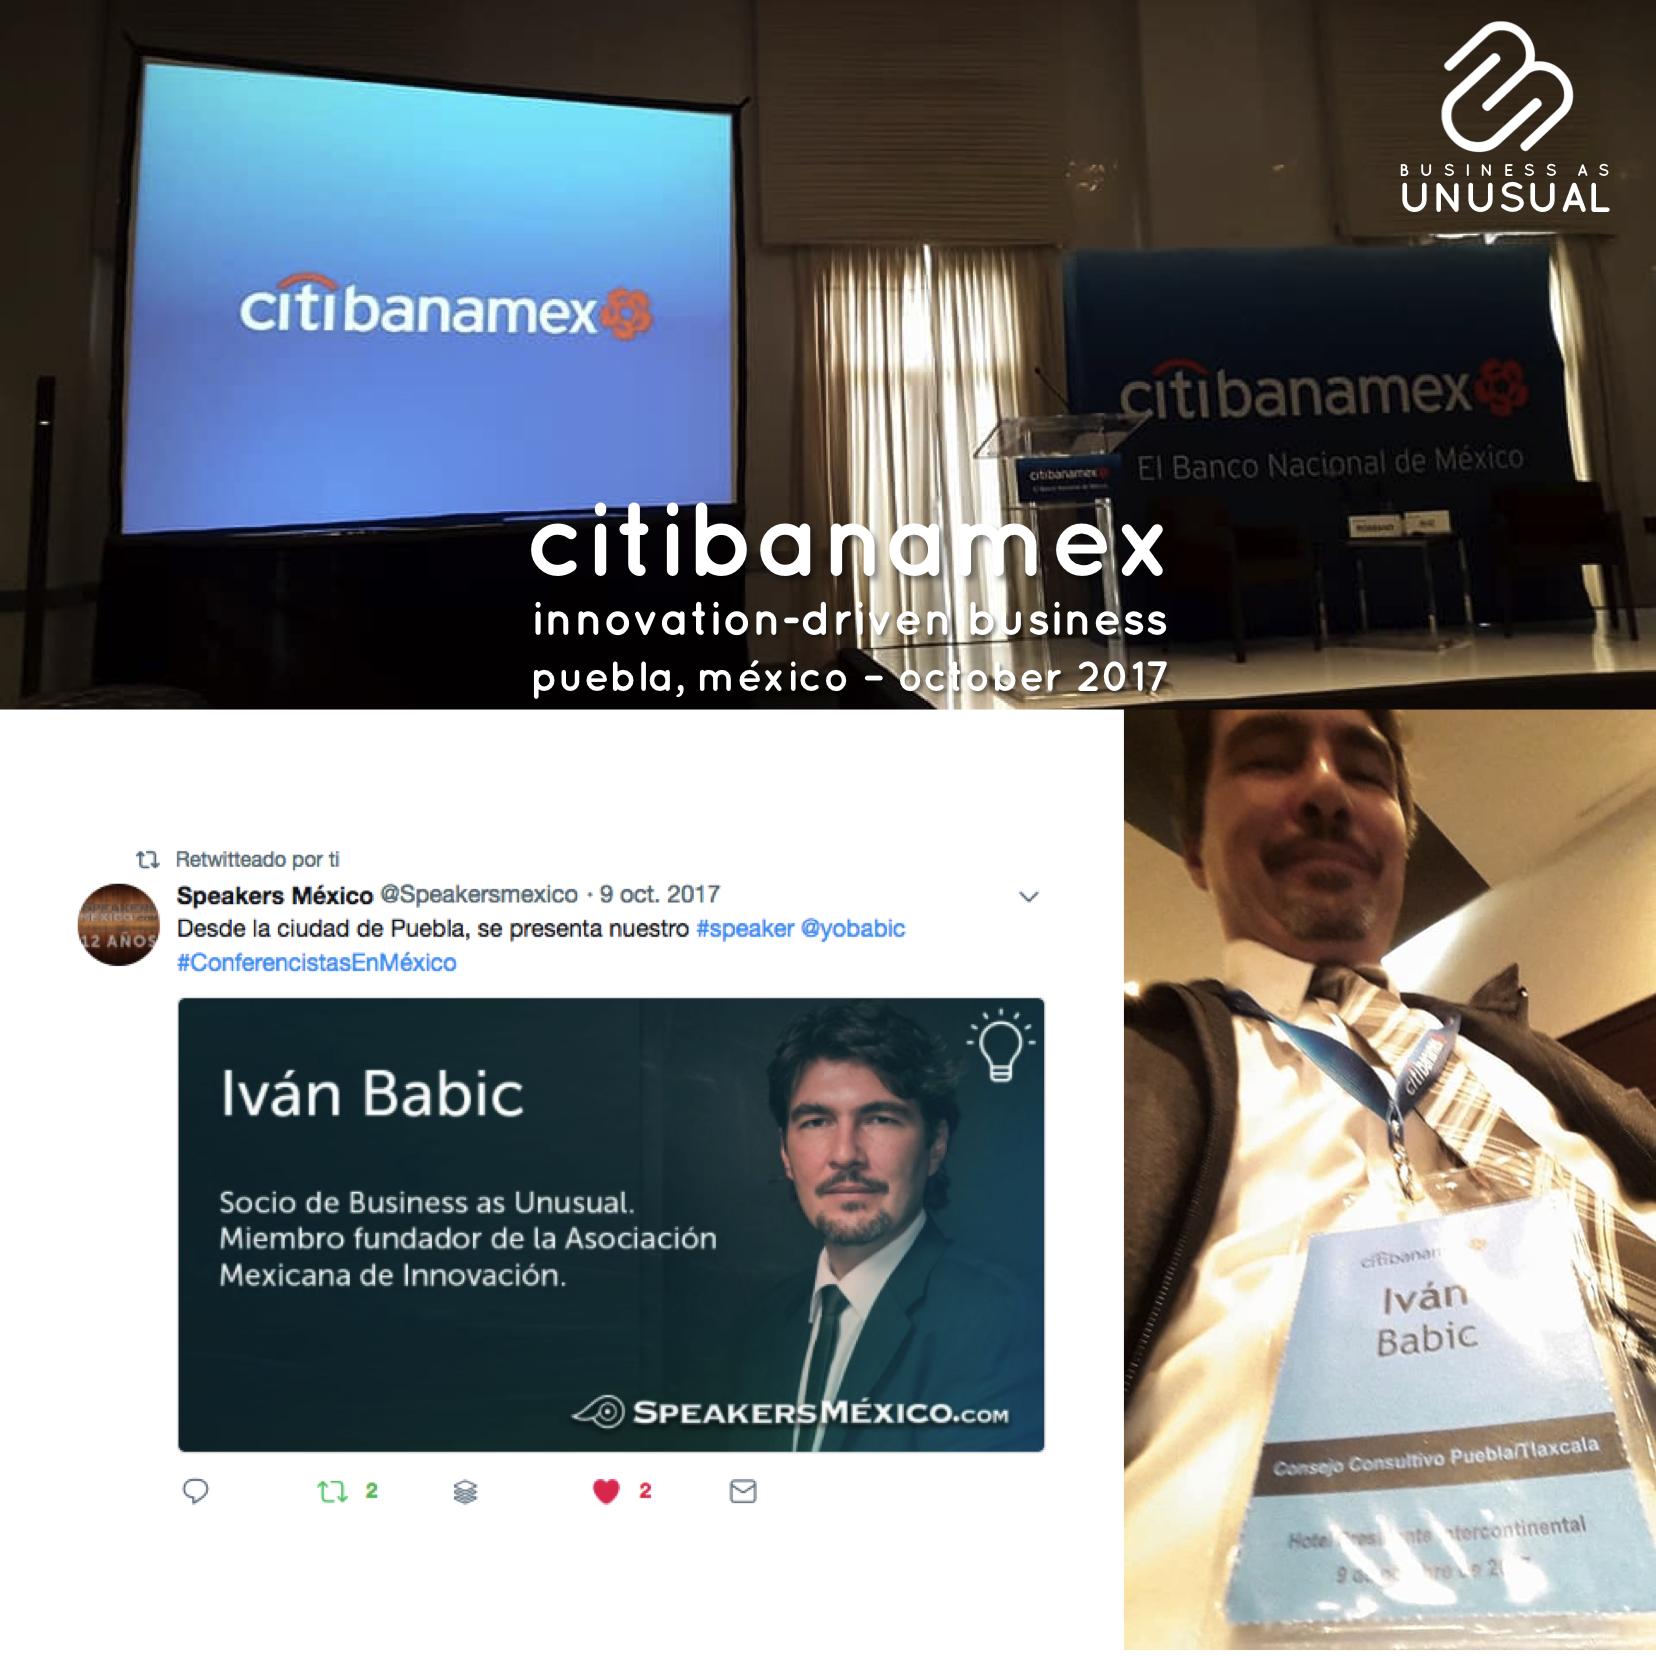 Citibanamex - Innovation-Driven Business - Puebla